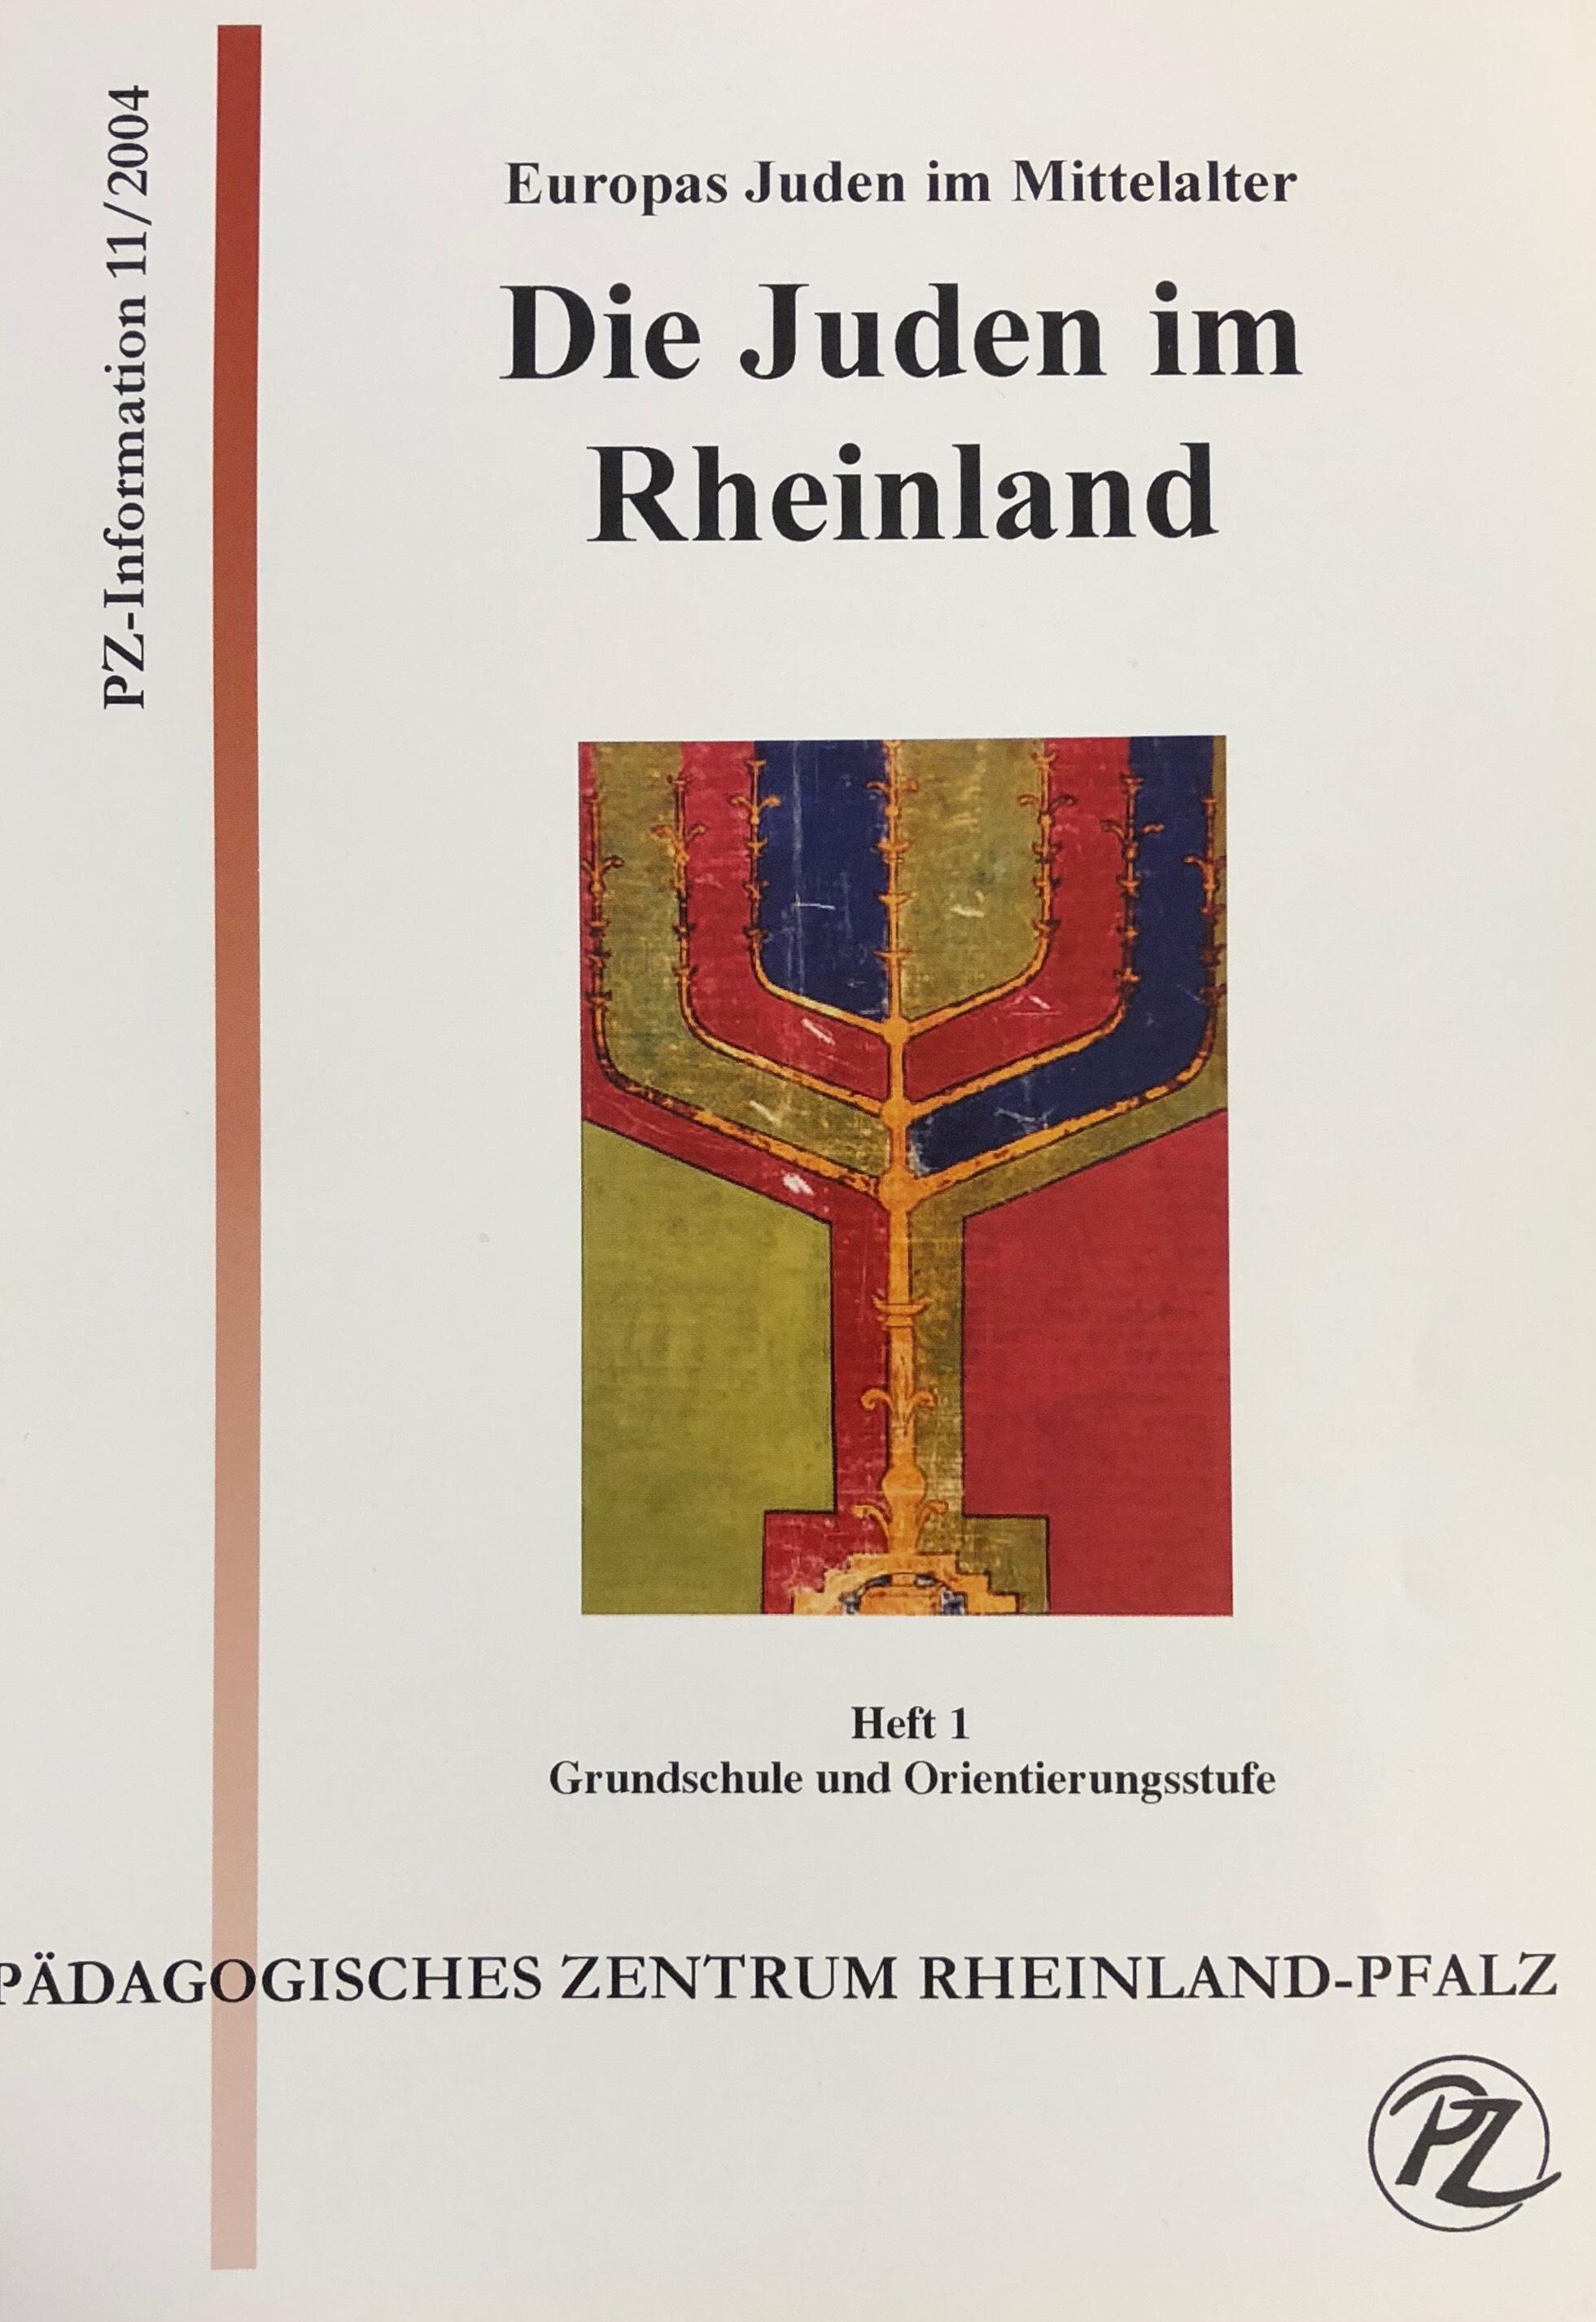 Europas Juden im Mittelalter